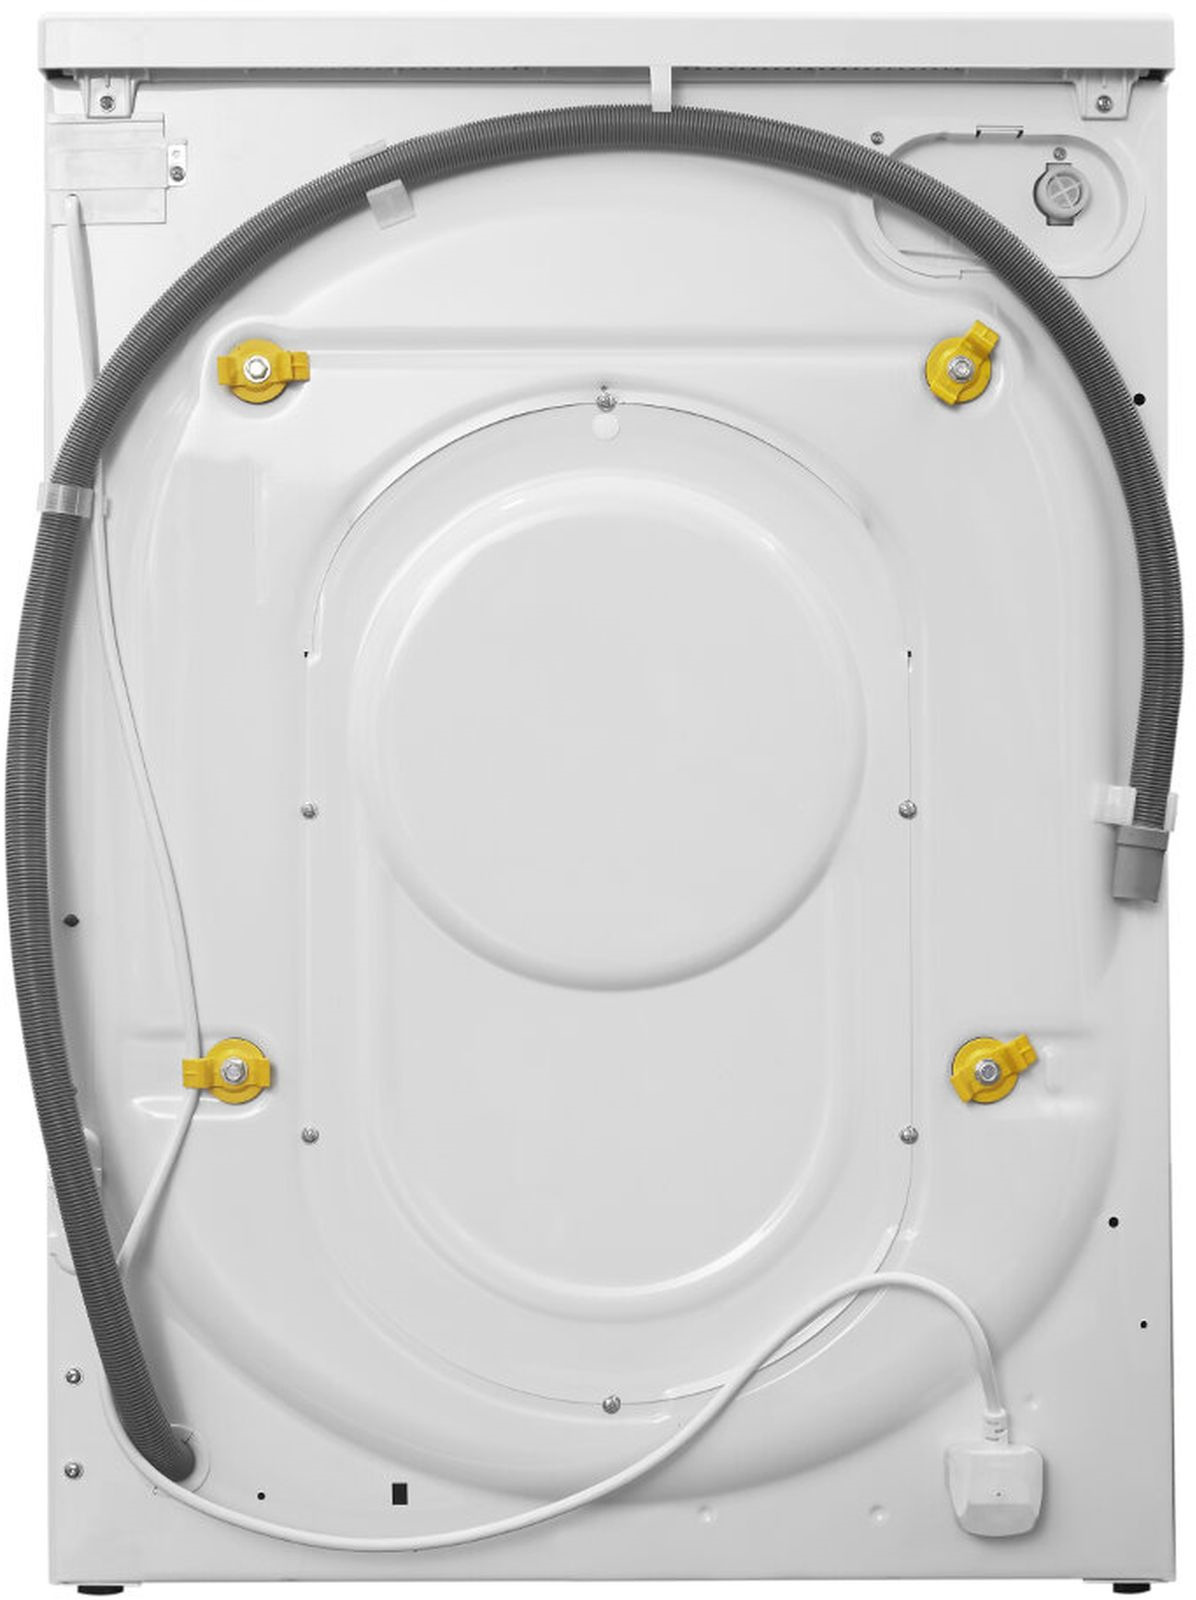 Стиральная машина Hotpoint-Ariston FDG 8640BS EU, 101603, белый Hotpoint-Ariston